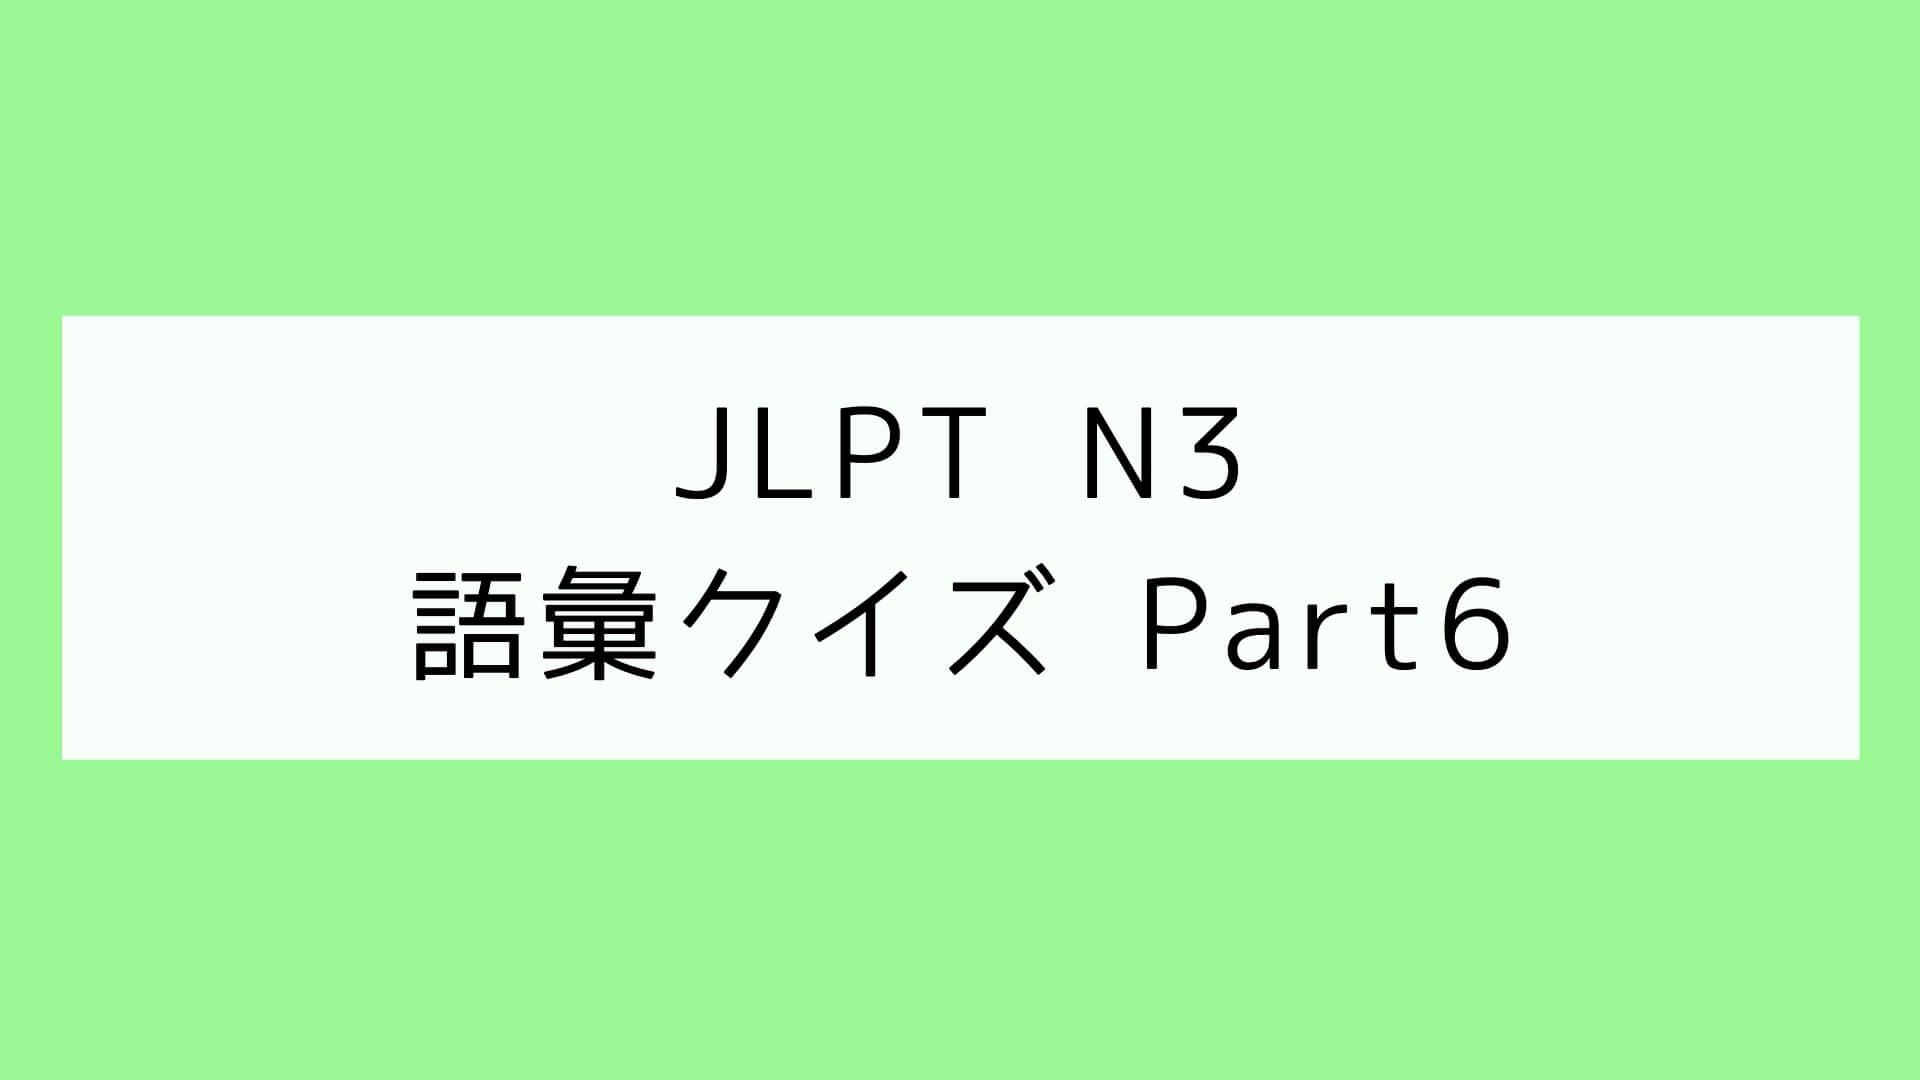 【JLPT N3】語彙クイズ Part6